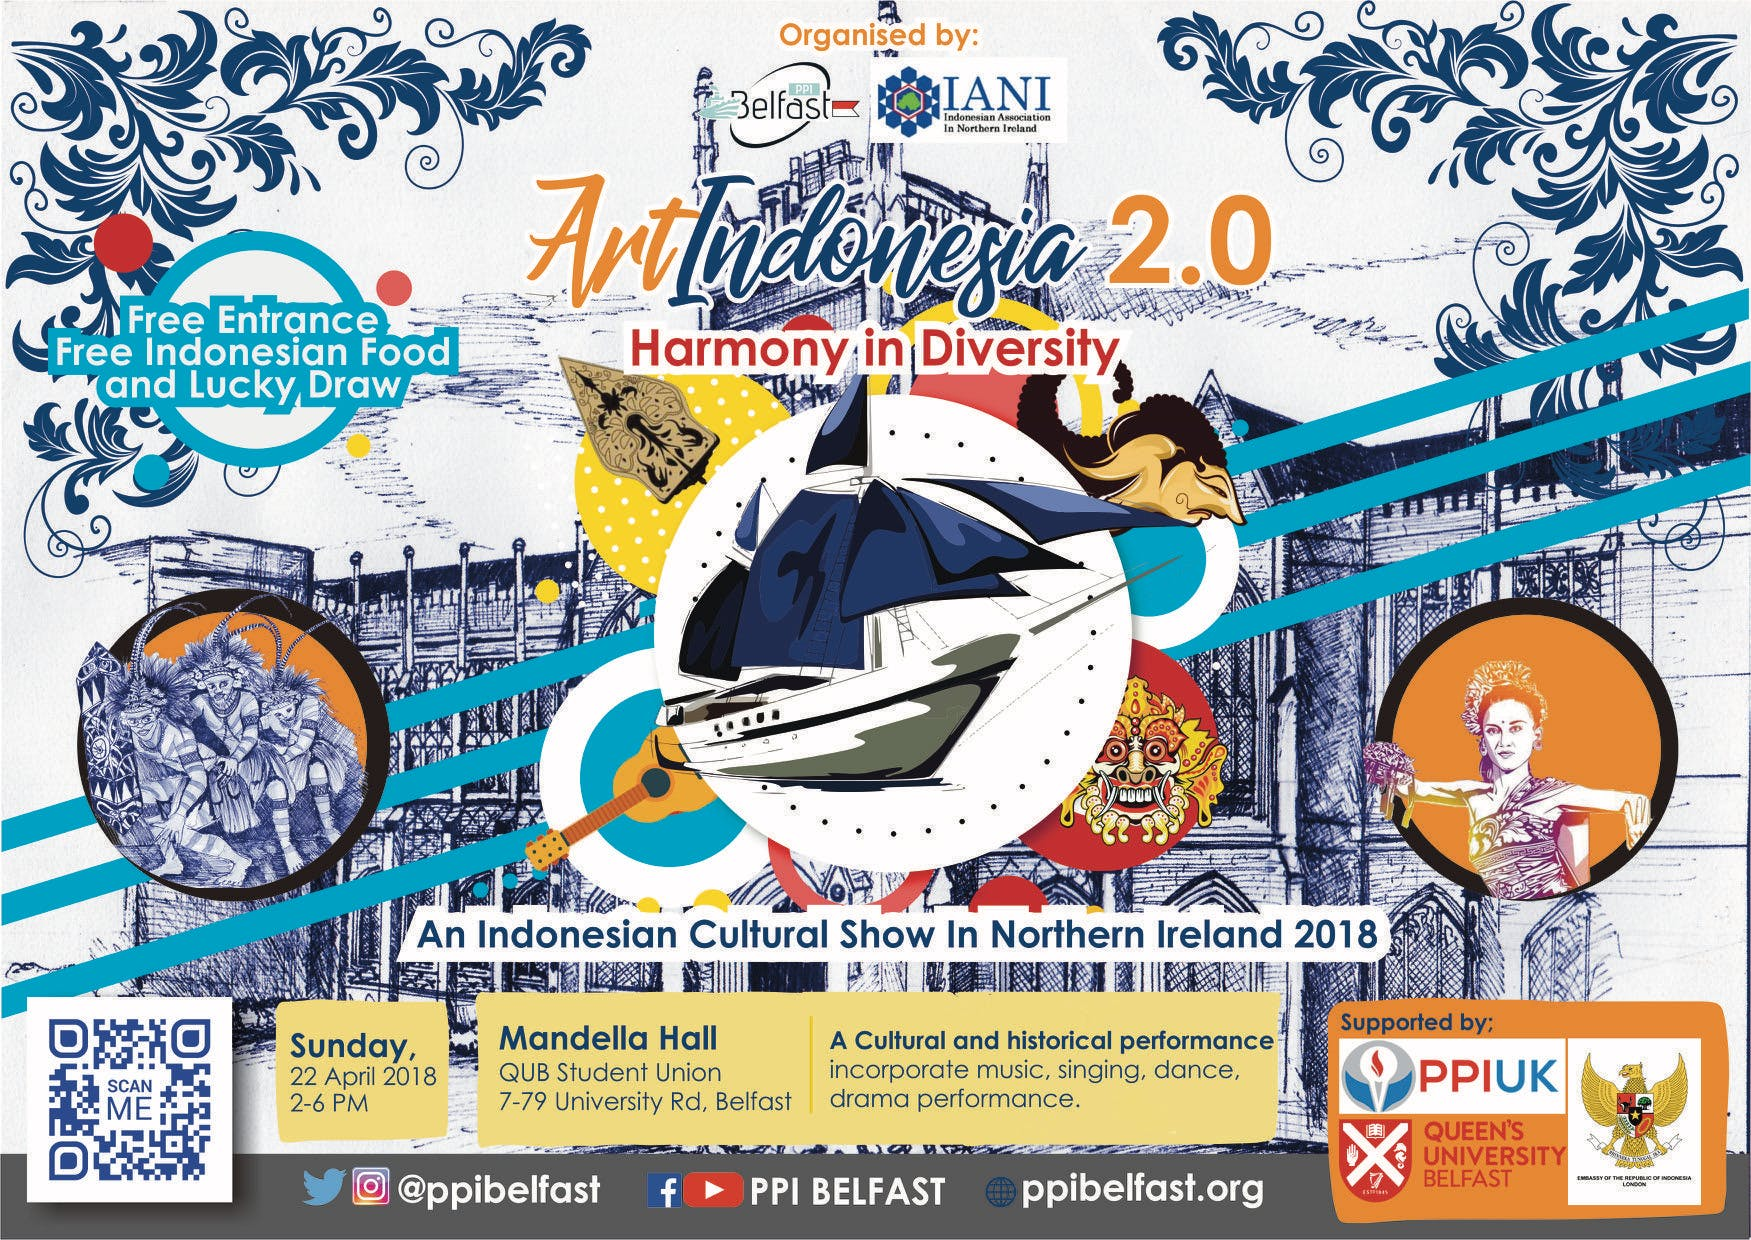 ArtIndonesia Festival 2.0